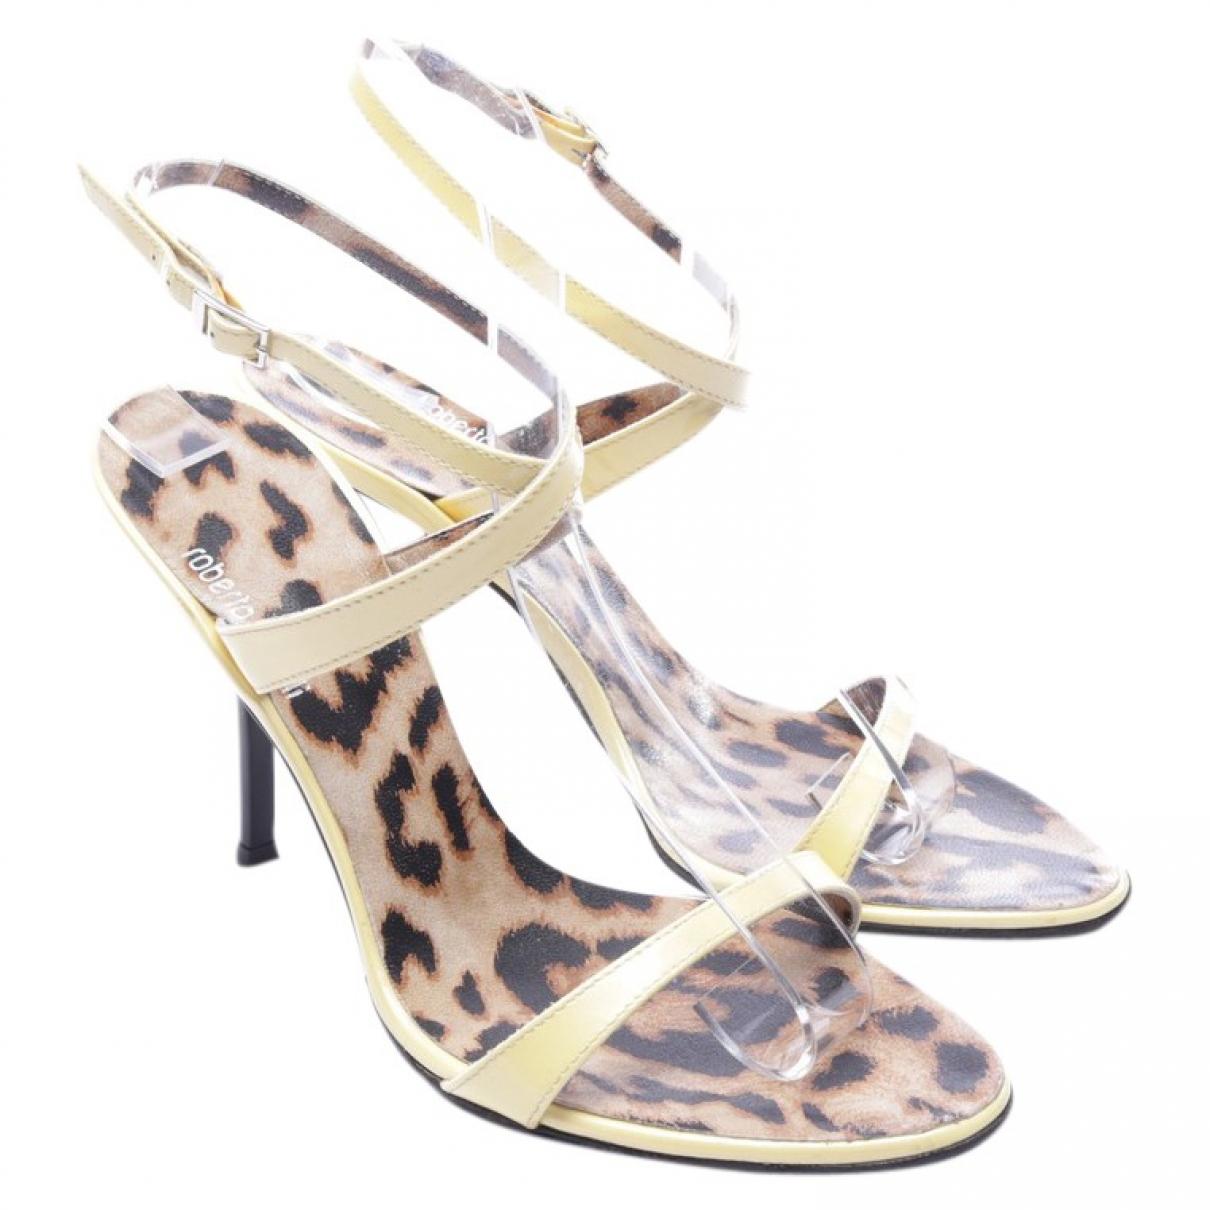 Roberto Cavalli \N Yellow Leather Sandals for Women 37.5 EU